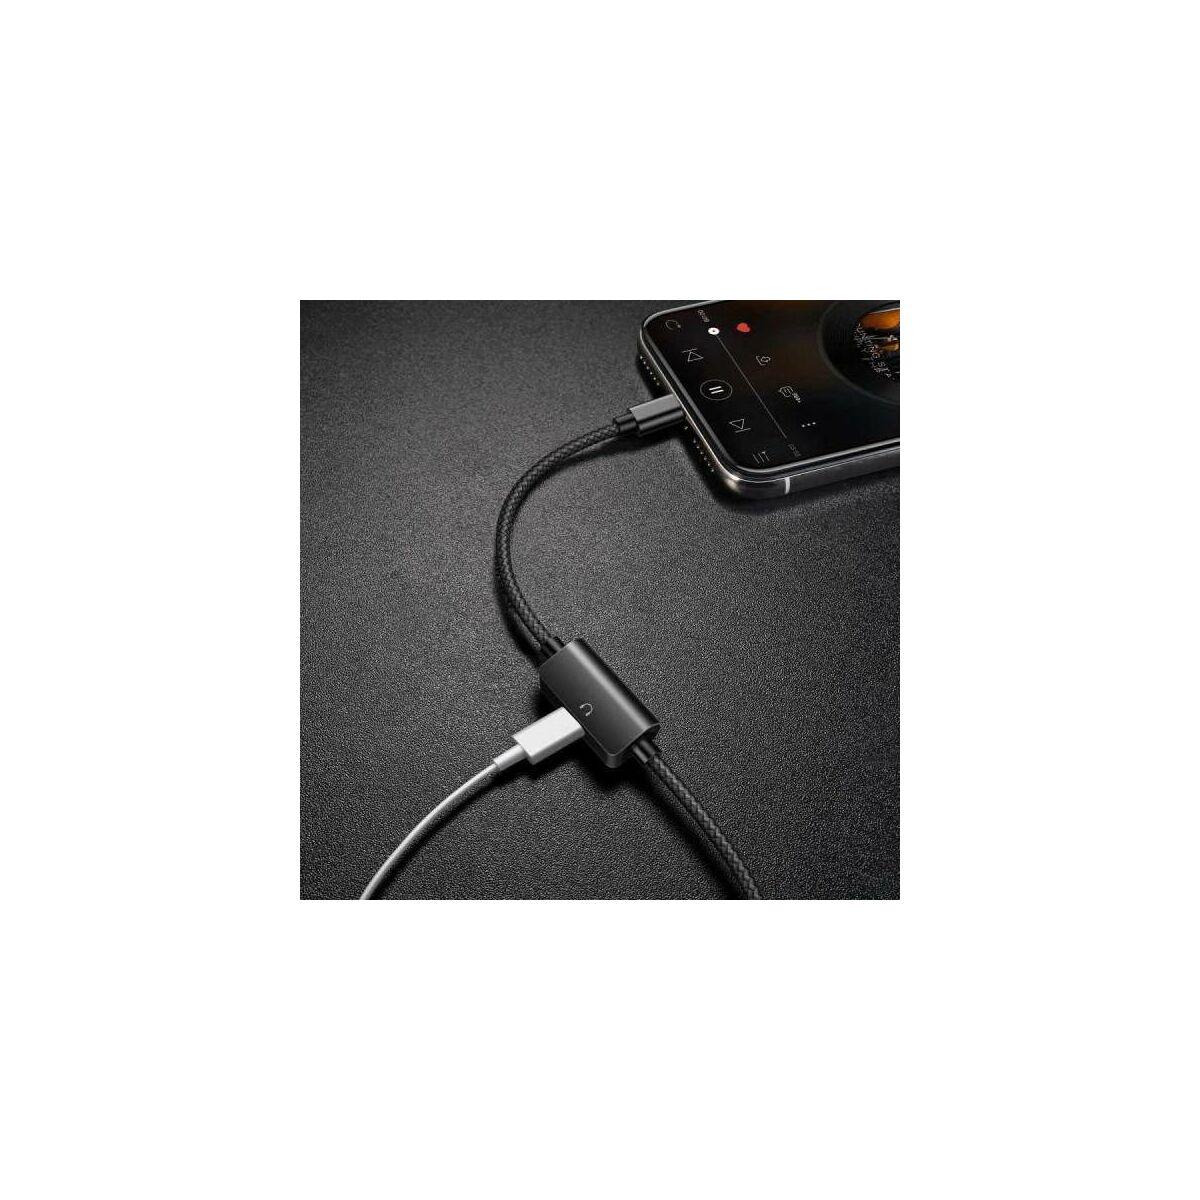 Baseus Audio kábel, Music series Audio, 2-in-1 multifunkciós(Lightning[apa] + Lightning[anya] port), 2A, 1m, fekete (CALYU-01)